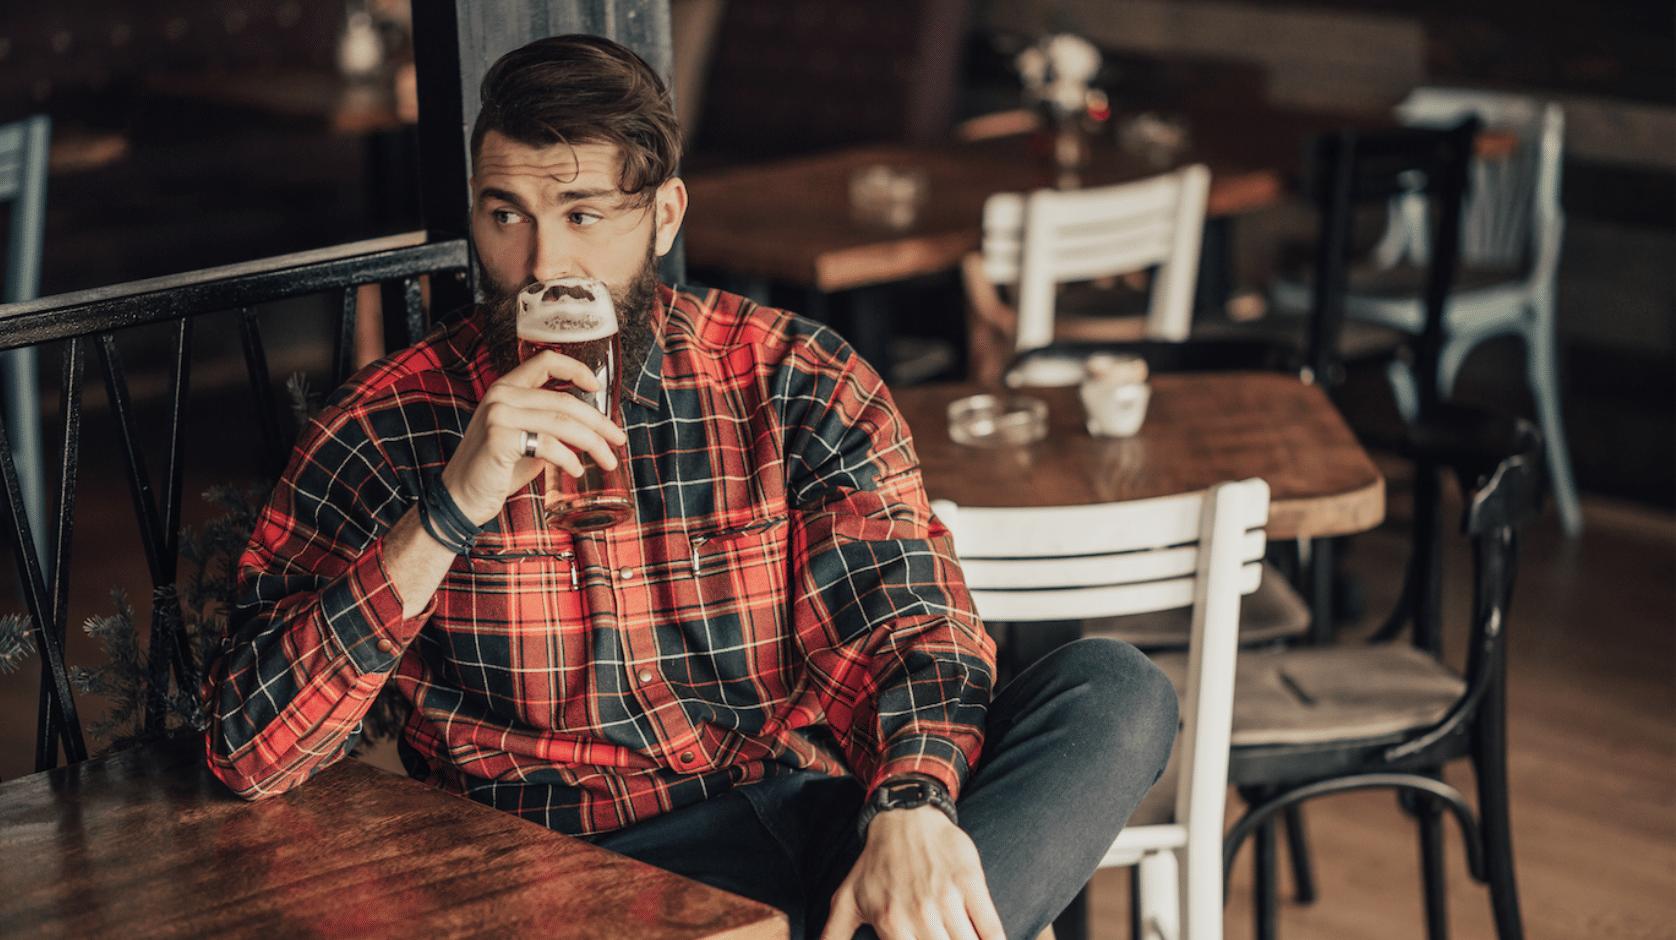 drinking alone in bar